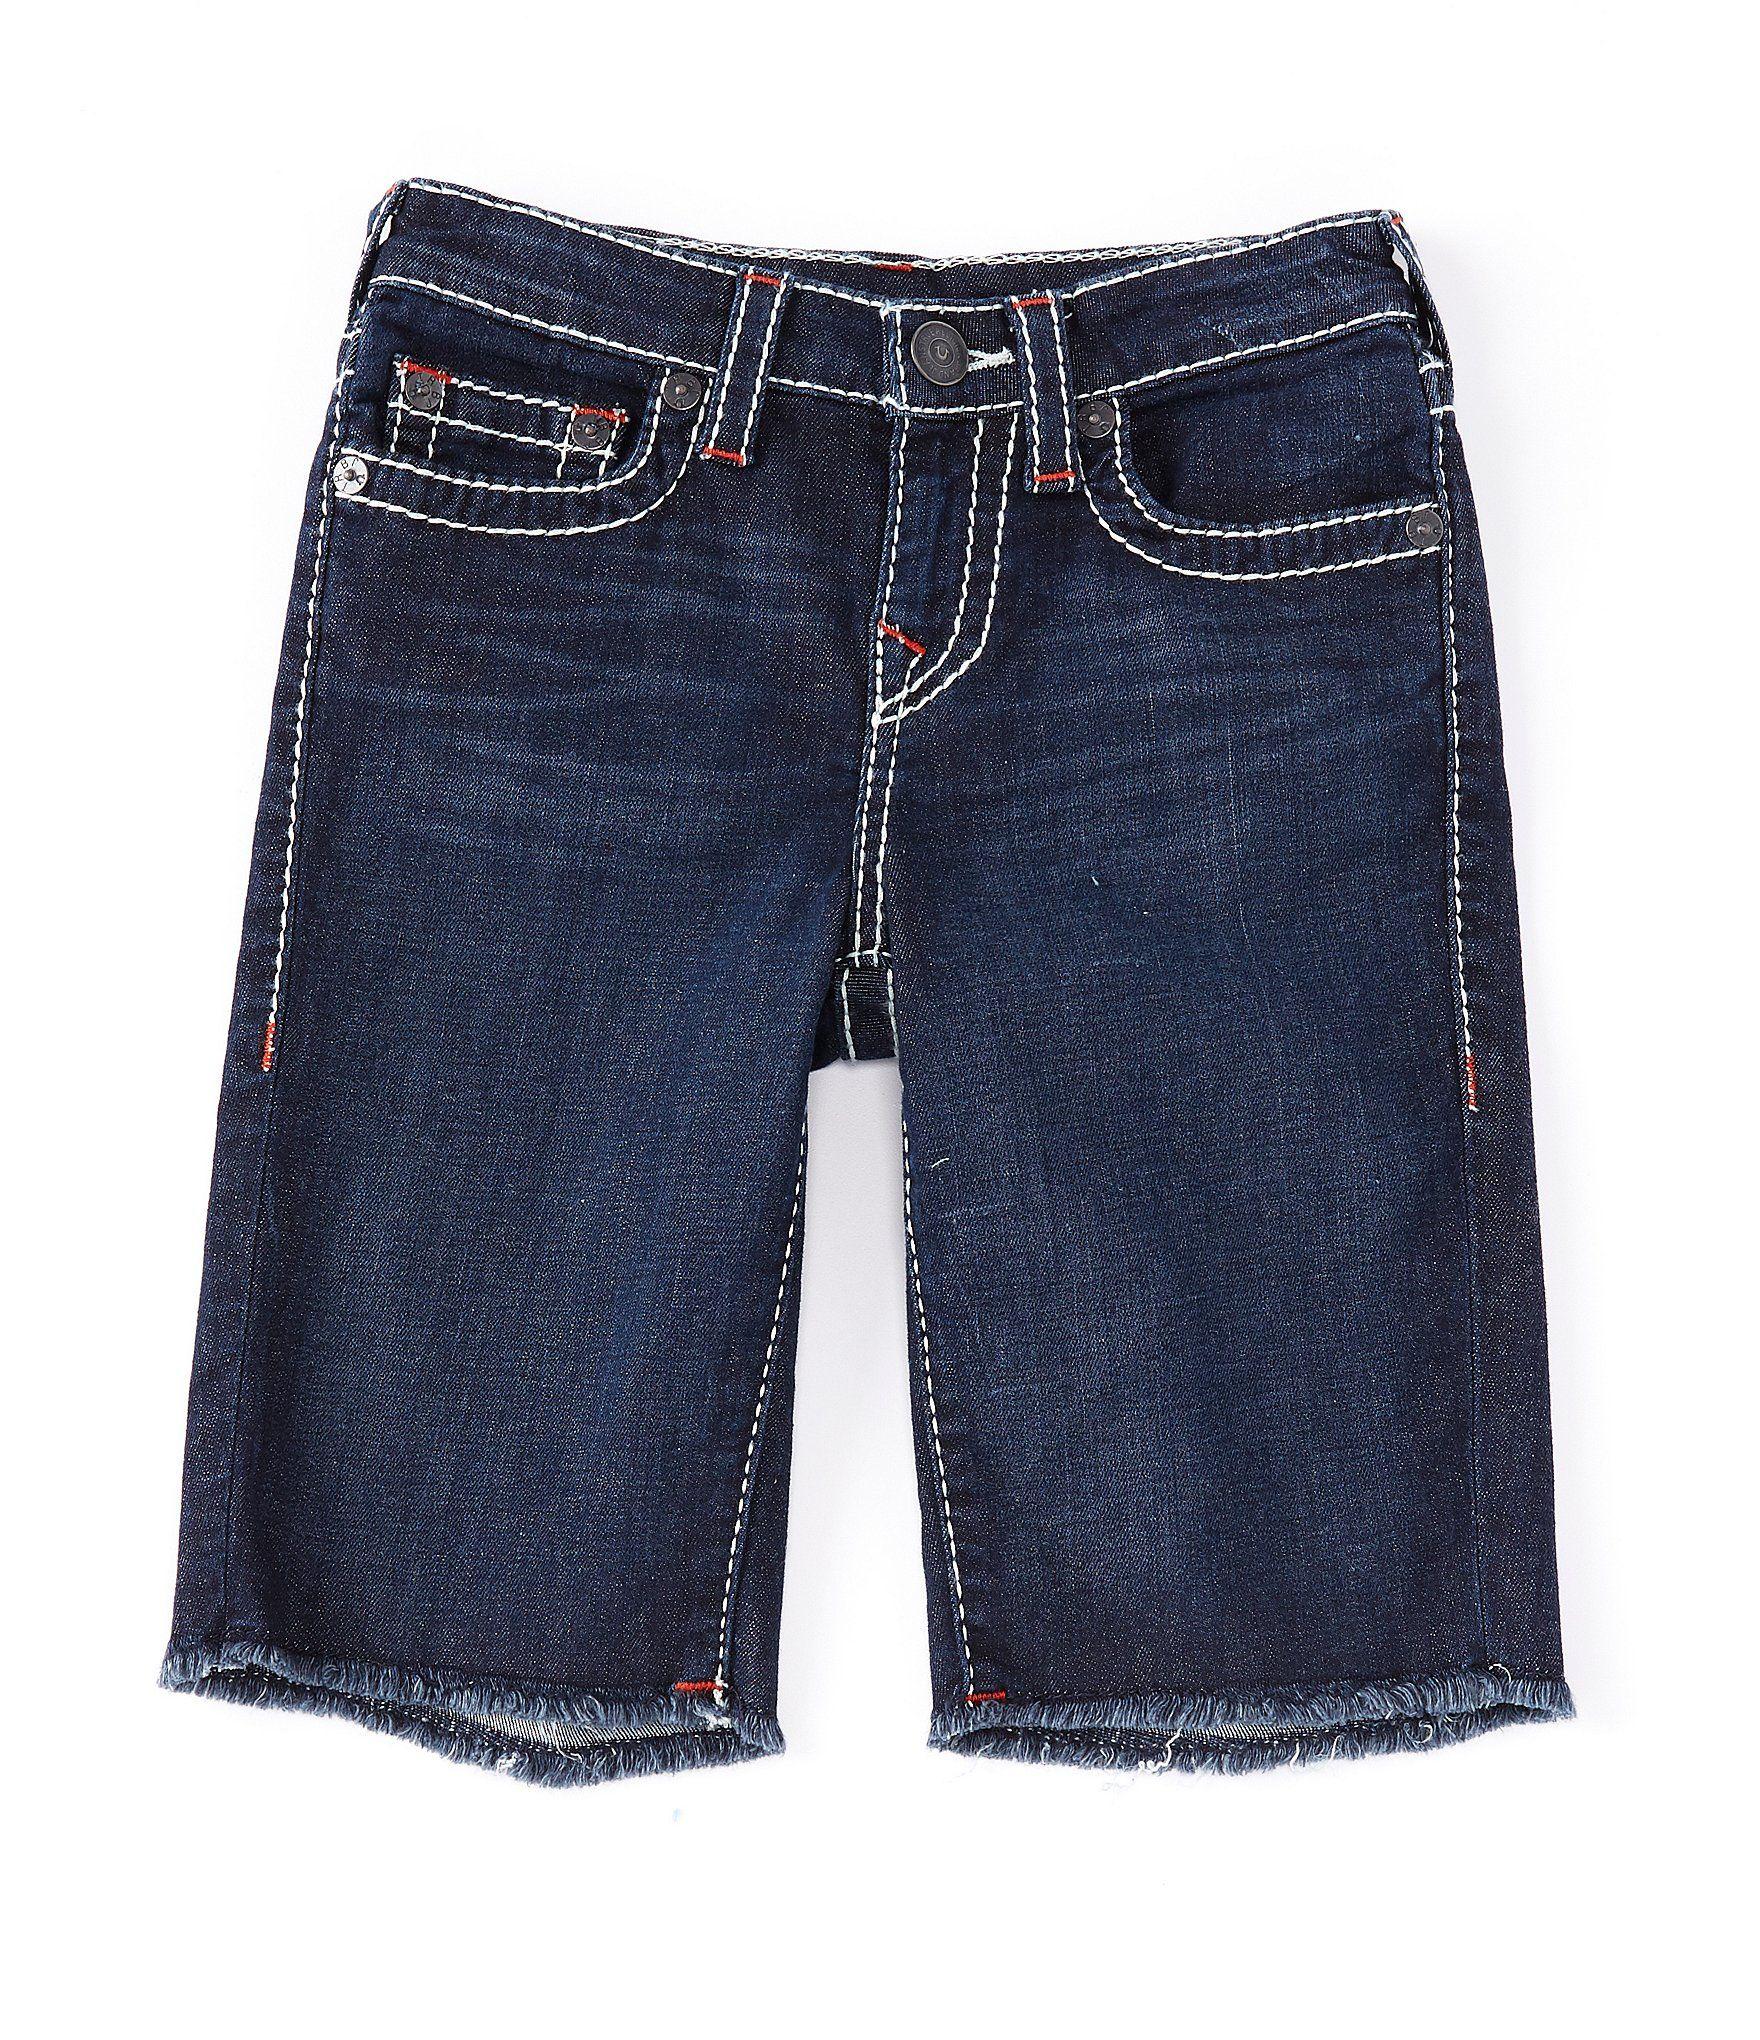 True Religion Big Boys 8-20 Geno Cut-Off Denim Shorts – Light Wash 10